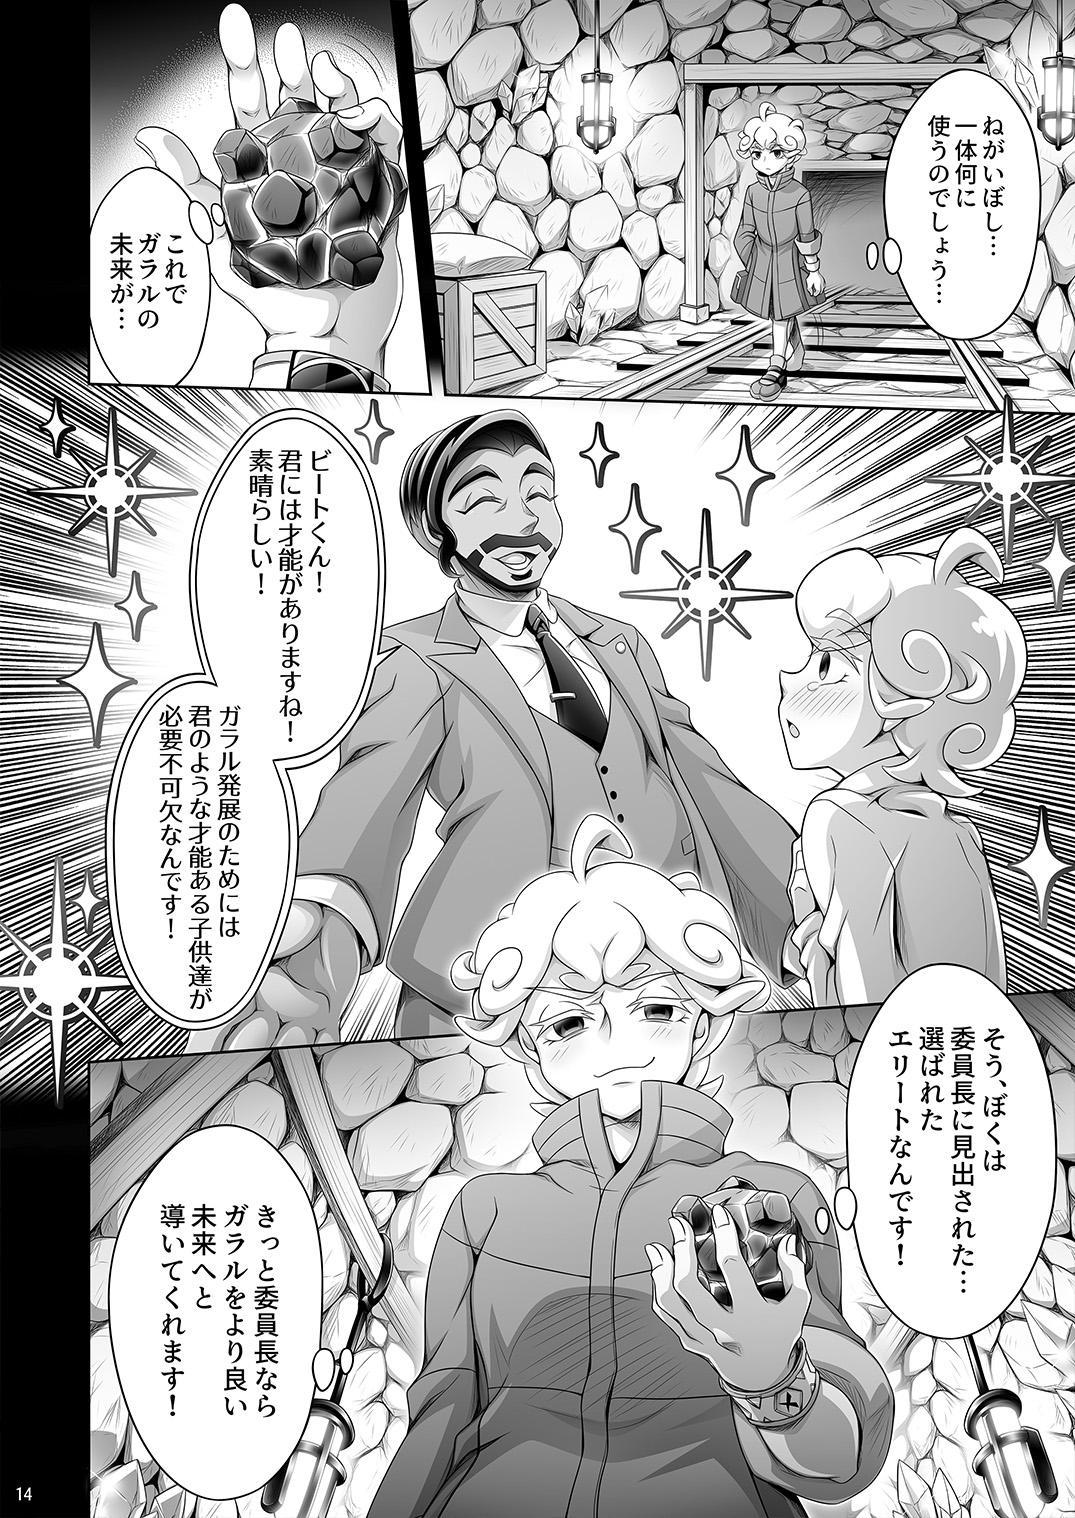 Shounen Beet no Kenshin 13